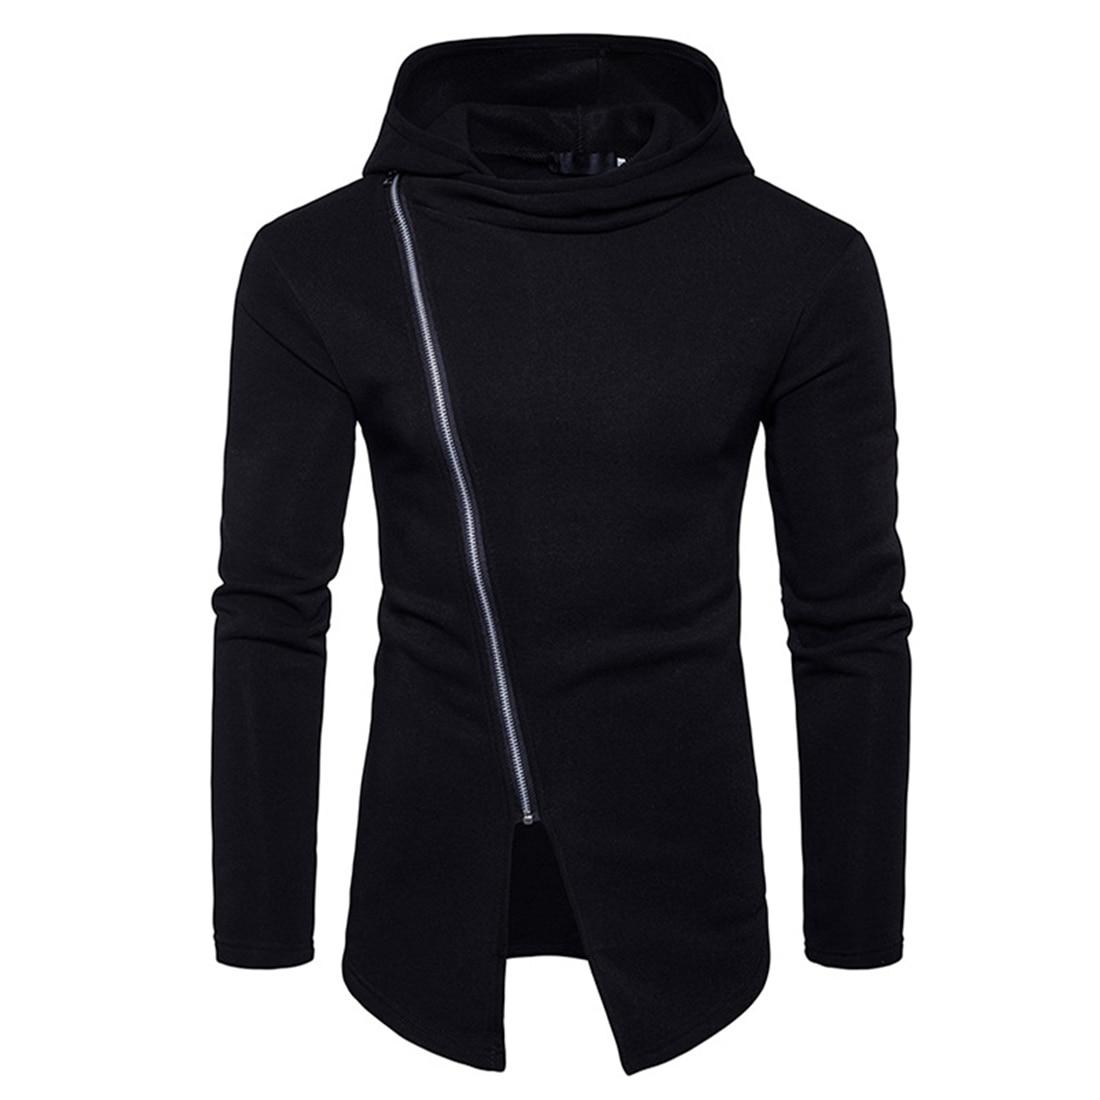 YJ(15) Store Mens Stylish Hoodies Slim Sweats Casual Zipper Hooded Regular Solid Coat Jacket Coat Sportswear Winter Hip Hop Clothes Outwear